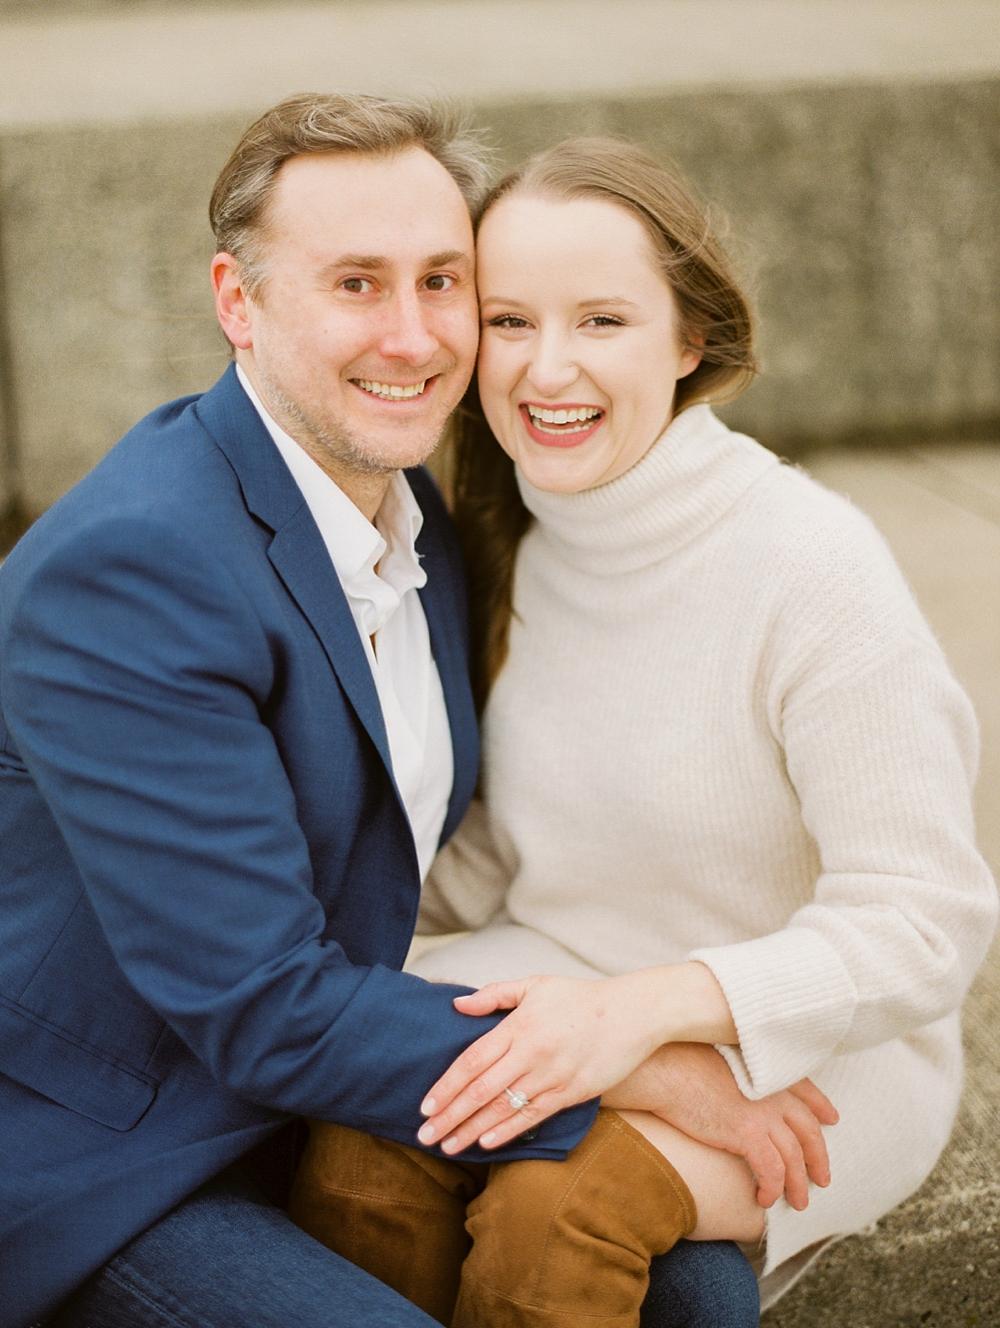 kristin-la-voie-photography-chicago-Wedding-Photographer-museum-campus-adler-planetarium-engagement-3